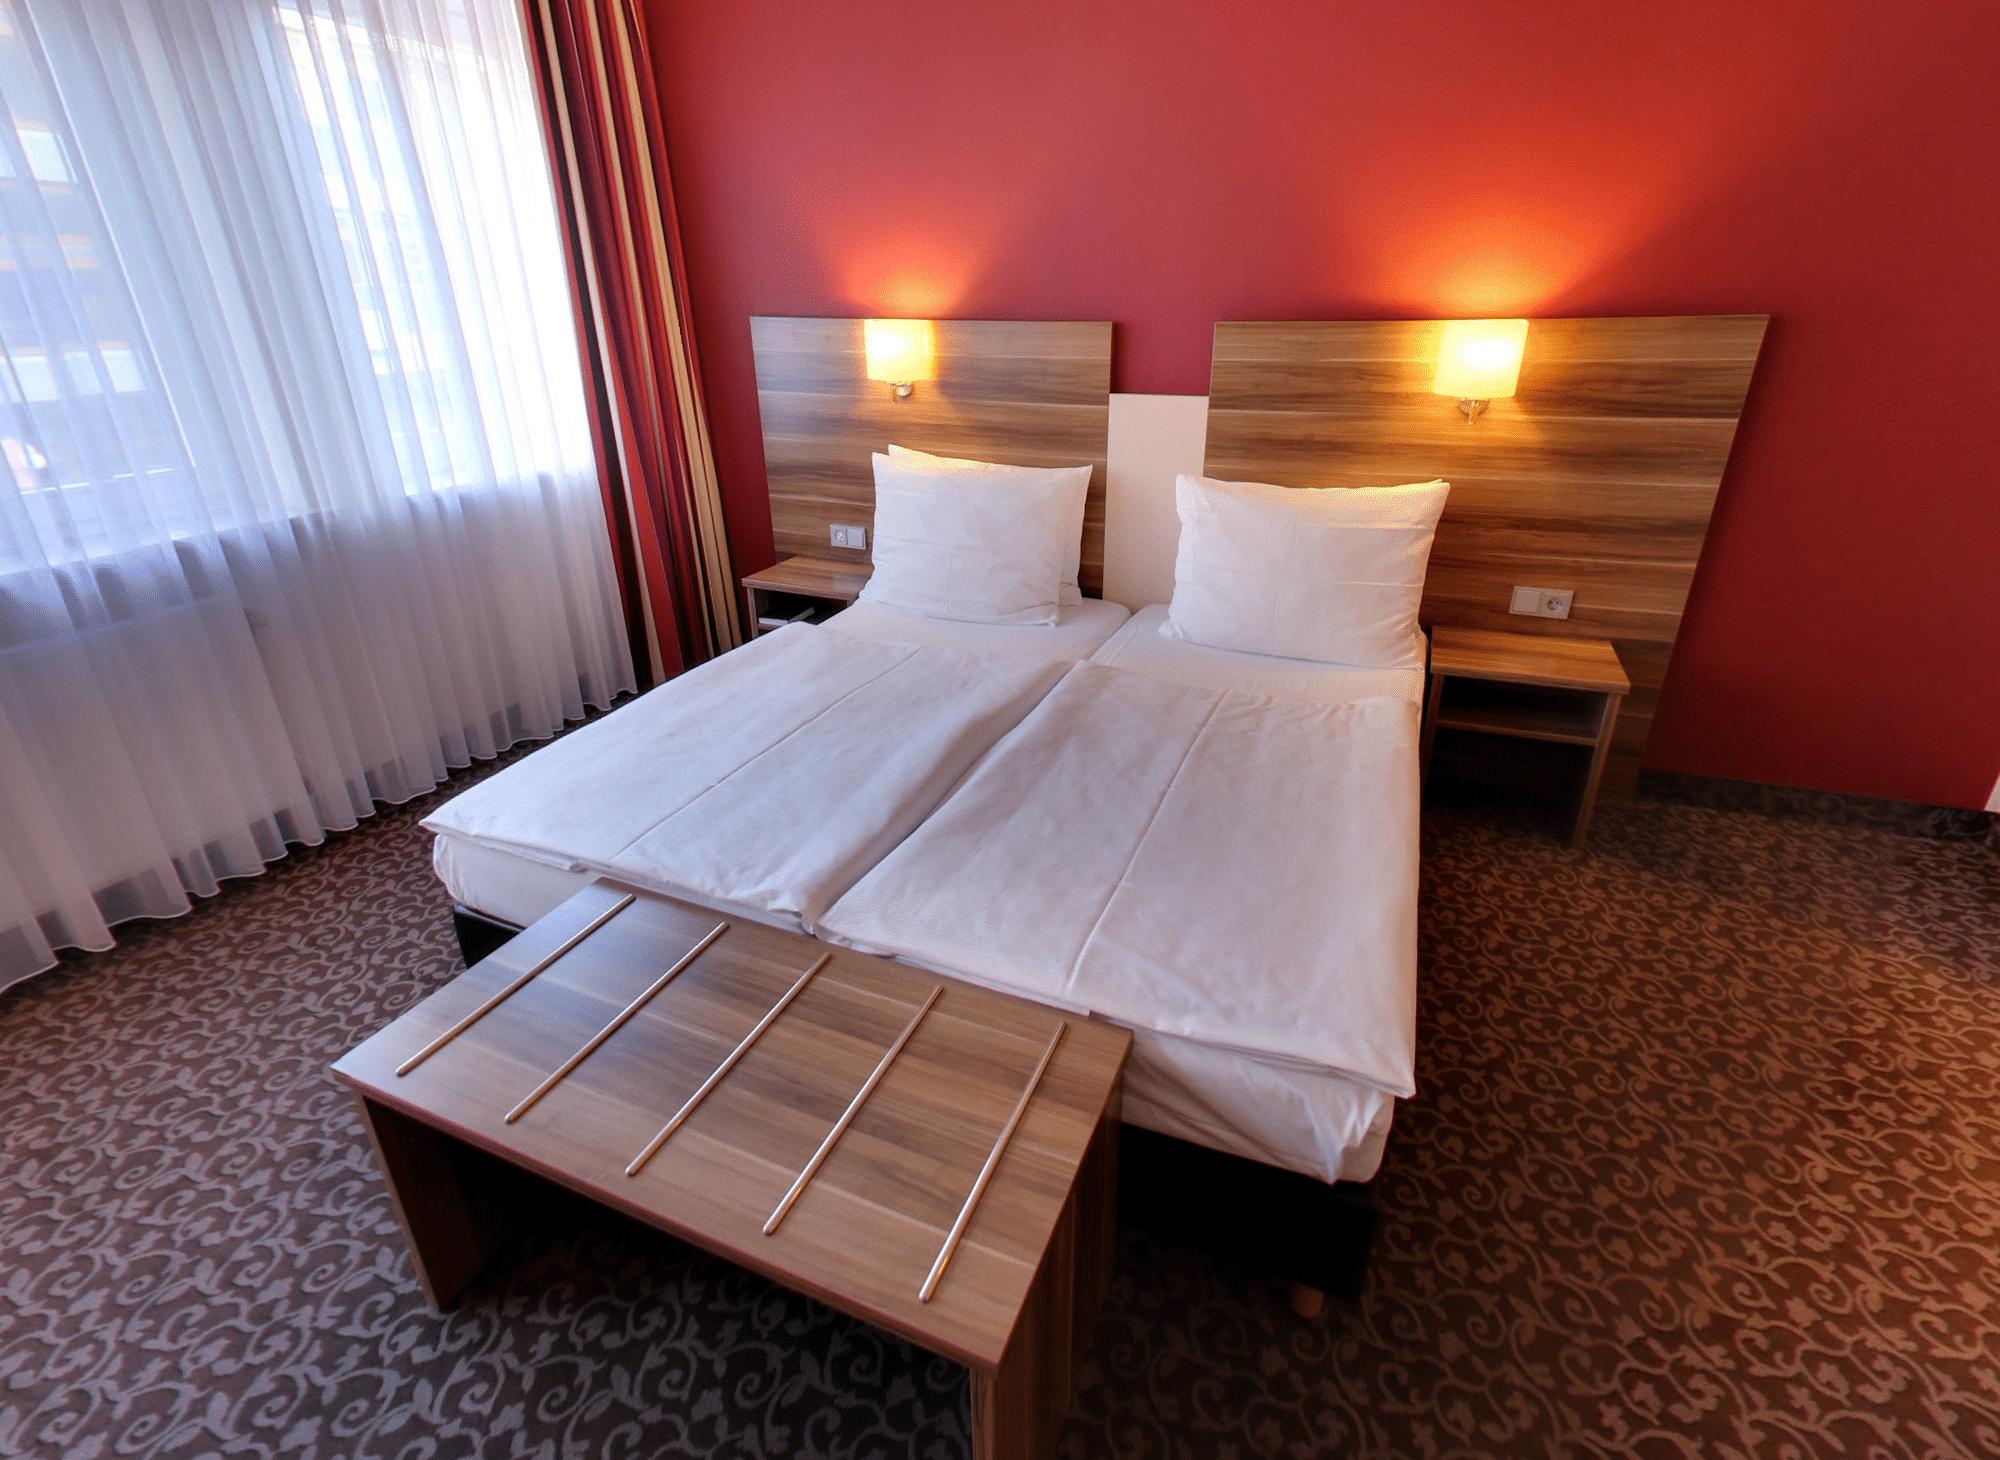 hotel am schloss ahrensburg patrick roddelkopf fotografie